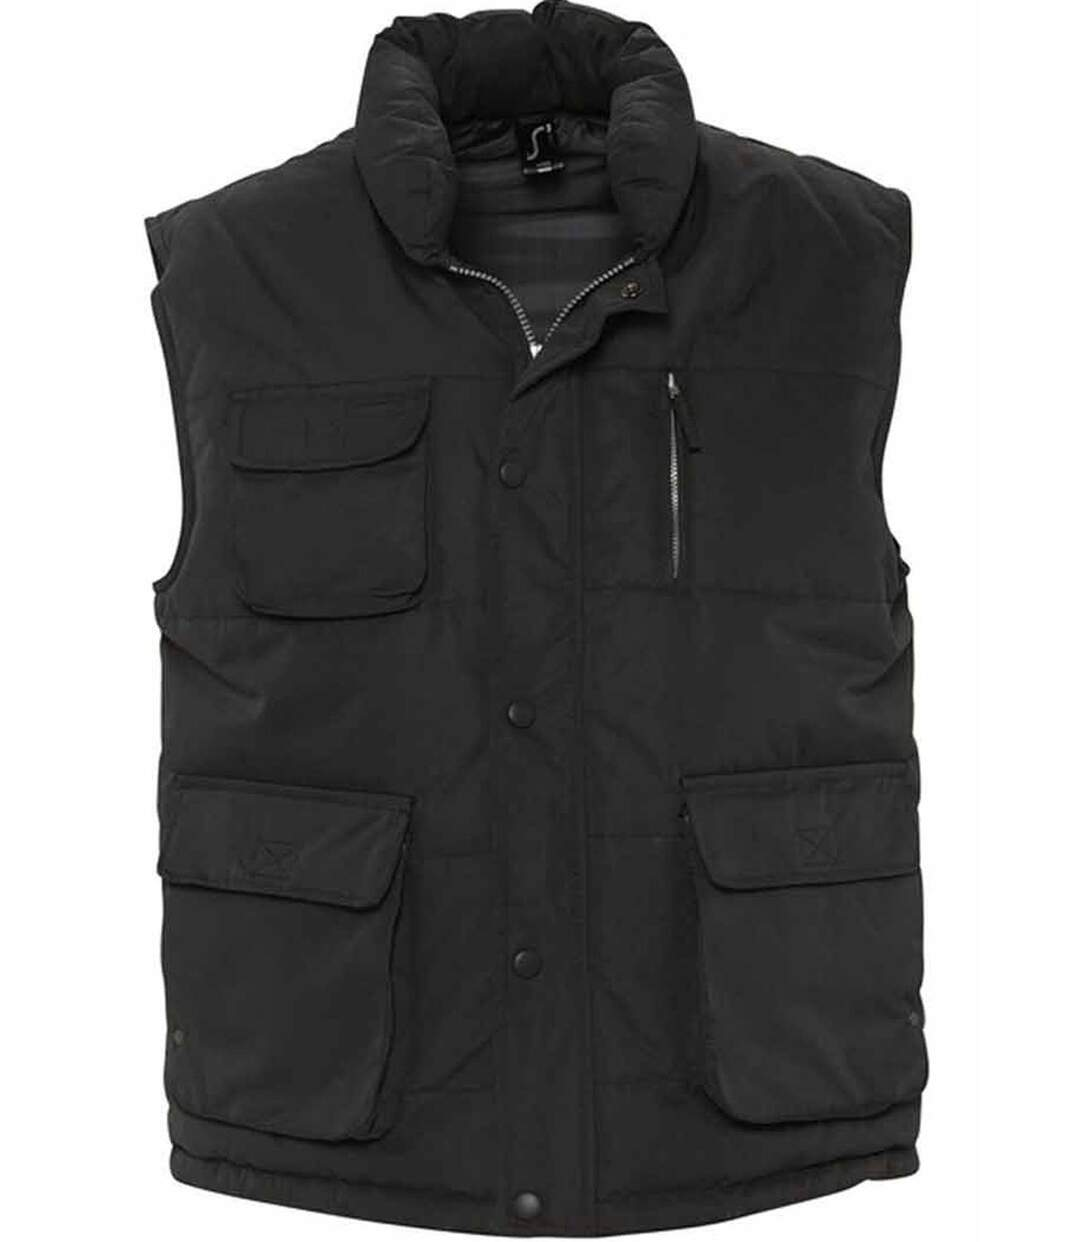 Blouson sans manches unisexe - Bodywarmer - 59000 - noir